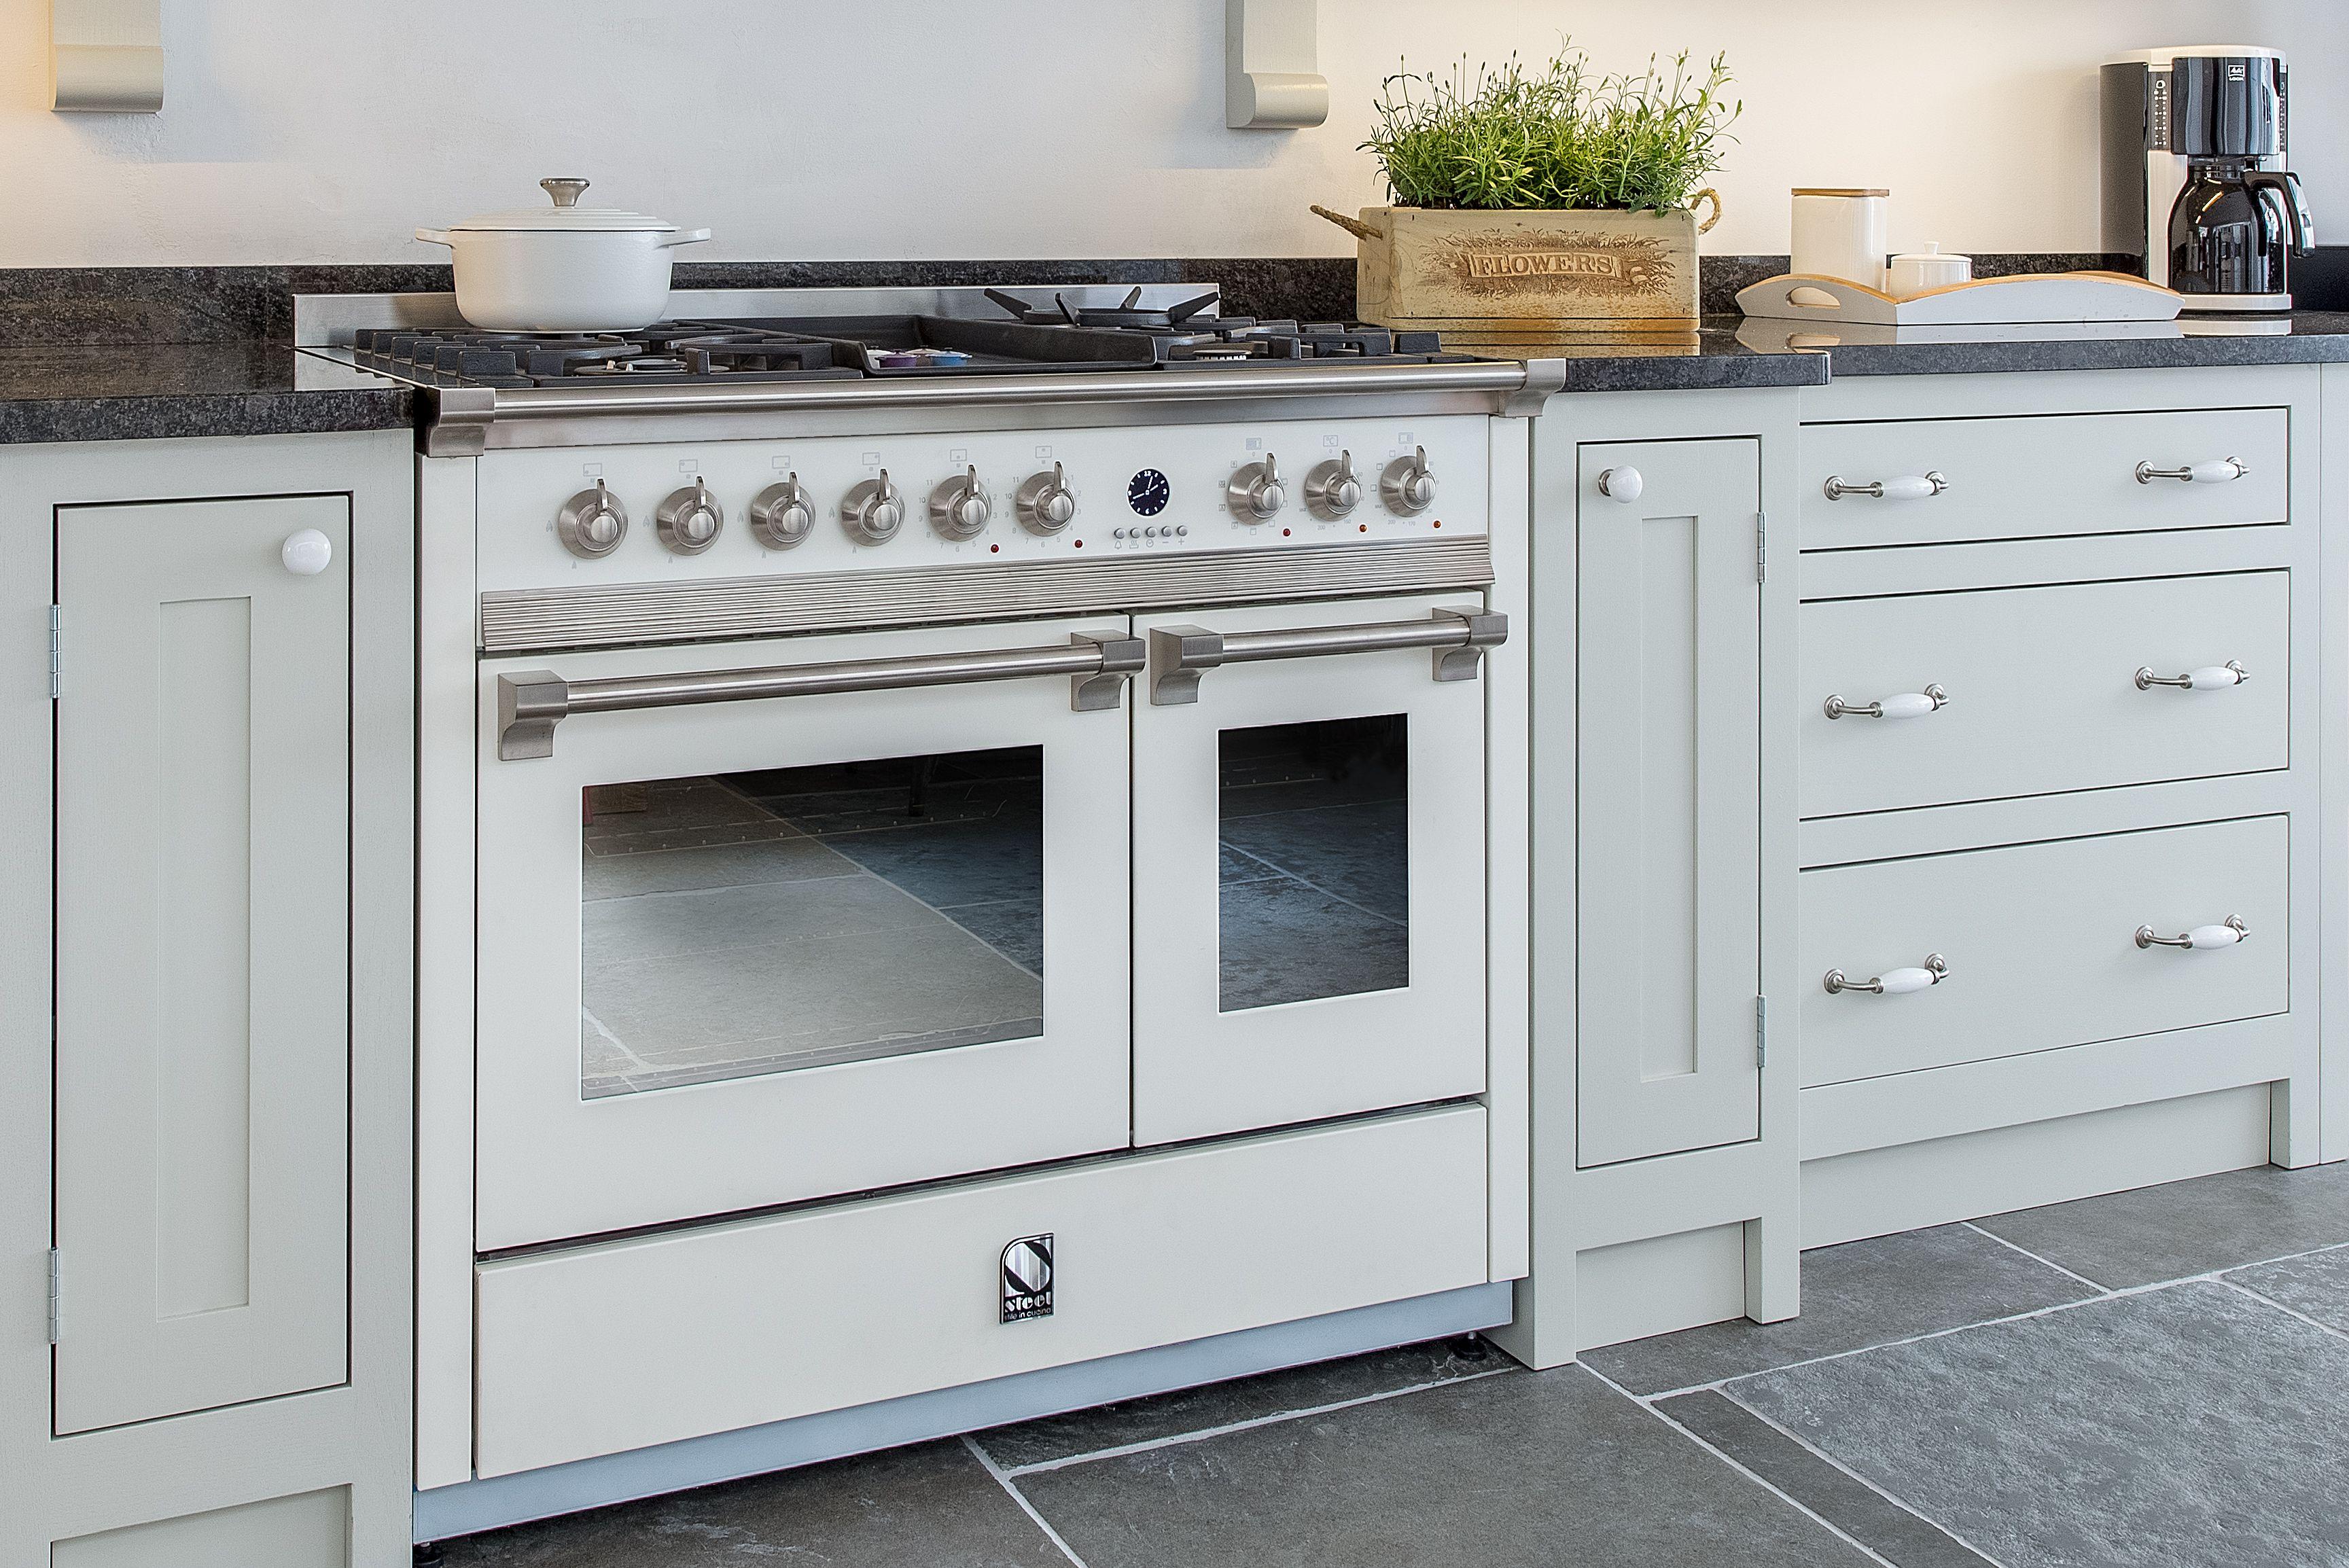 Ascot kitchen by Steel http://steelbrand.com.au/ | Ascot | Pinterest ...